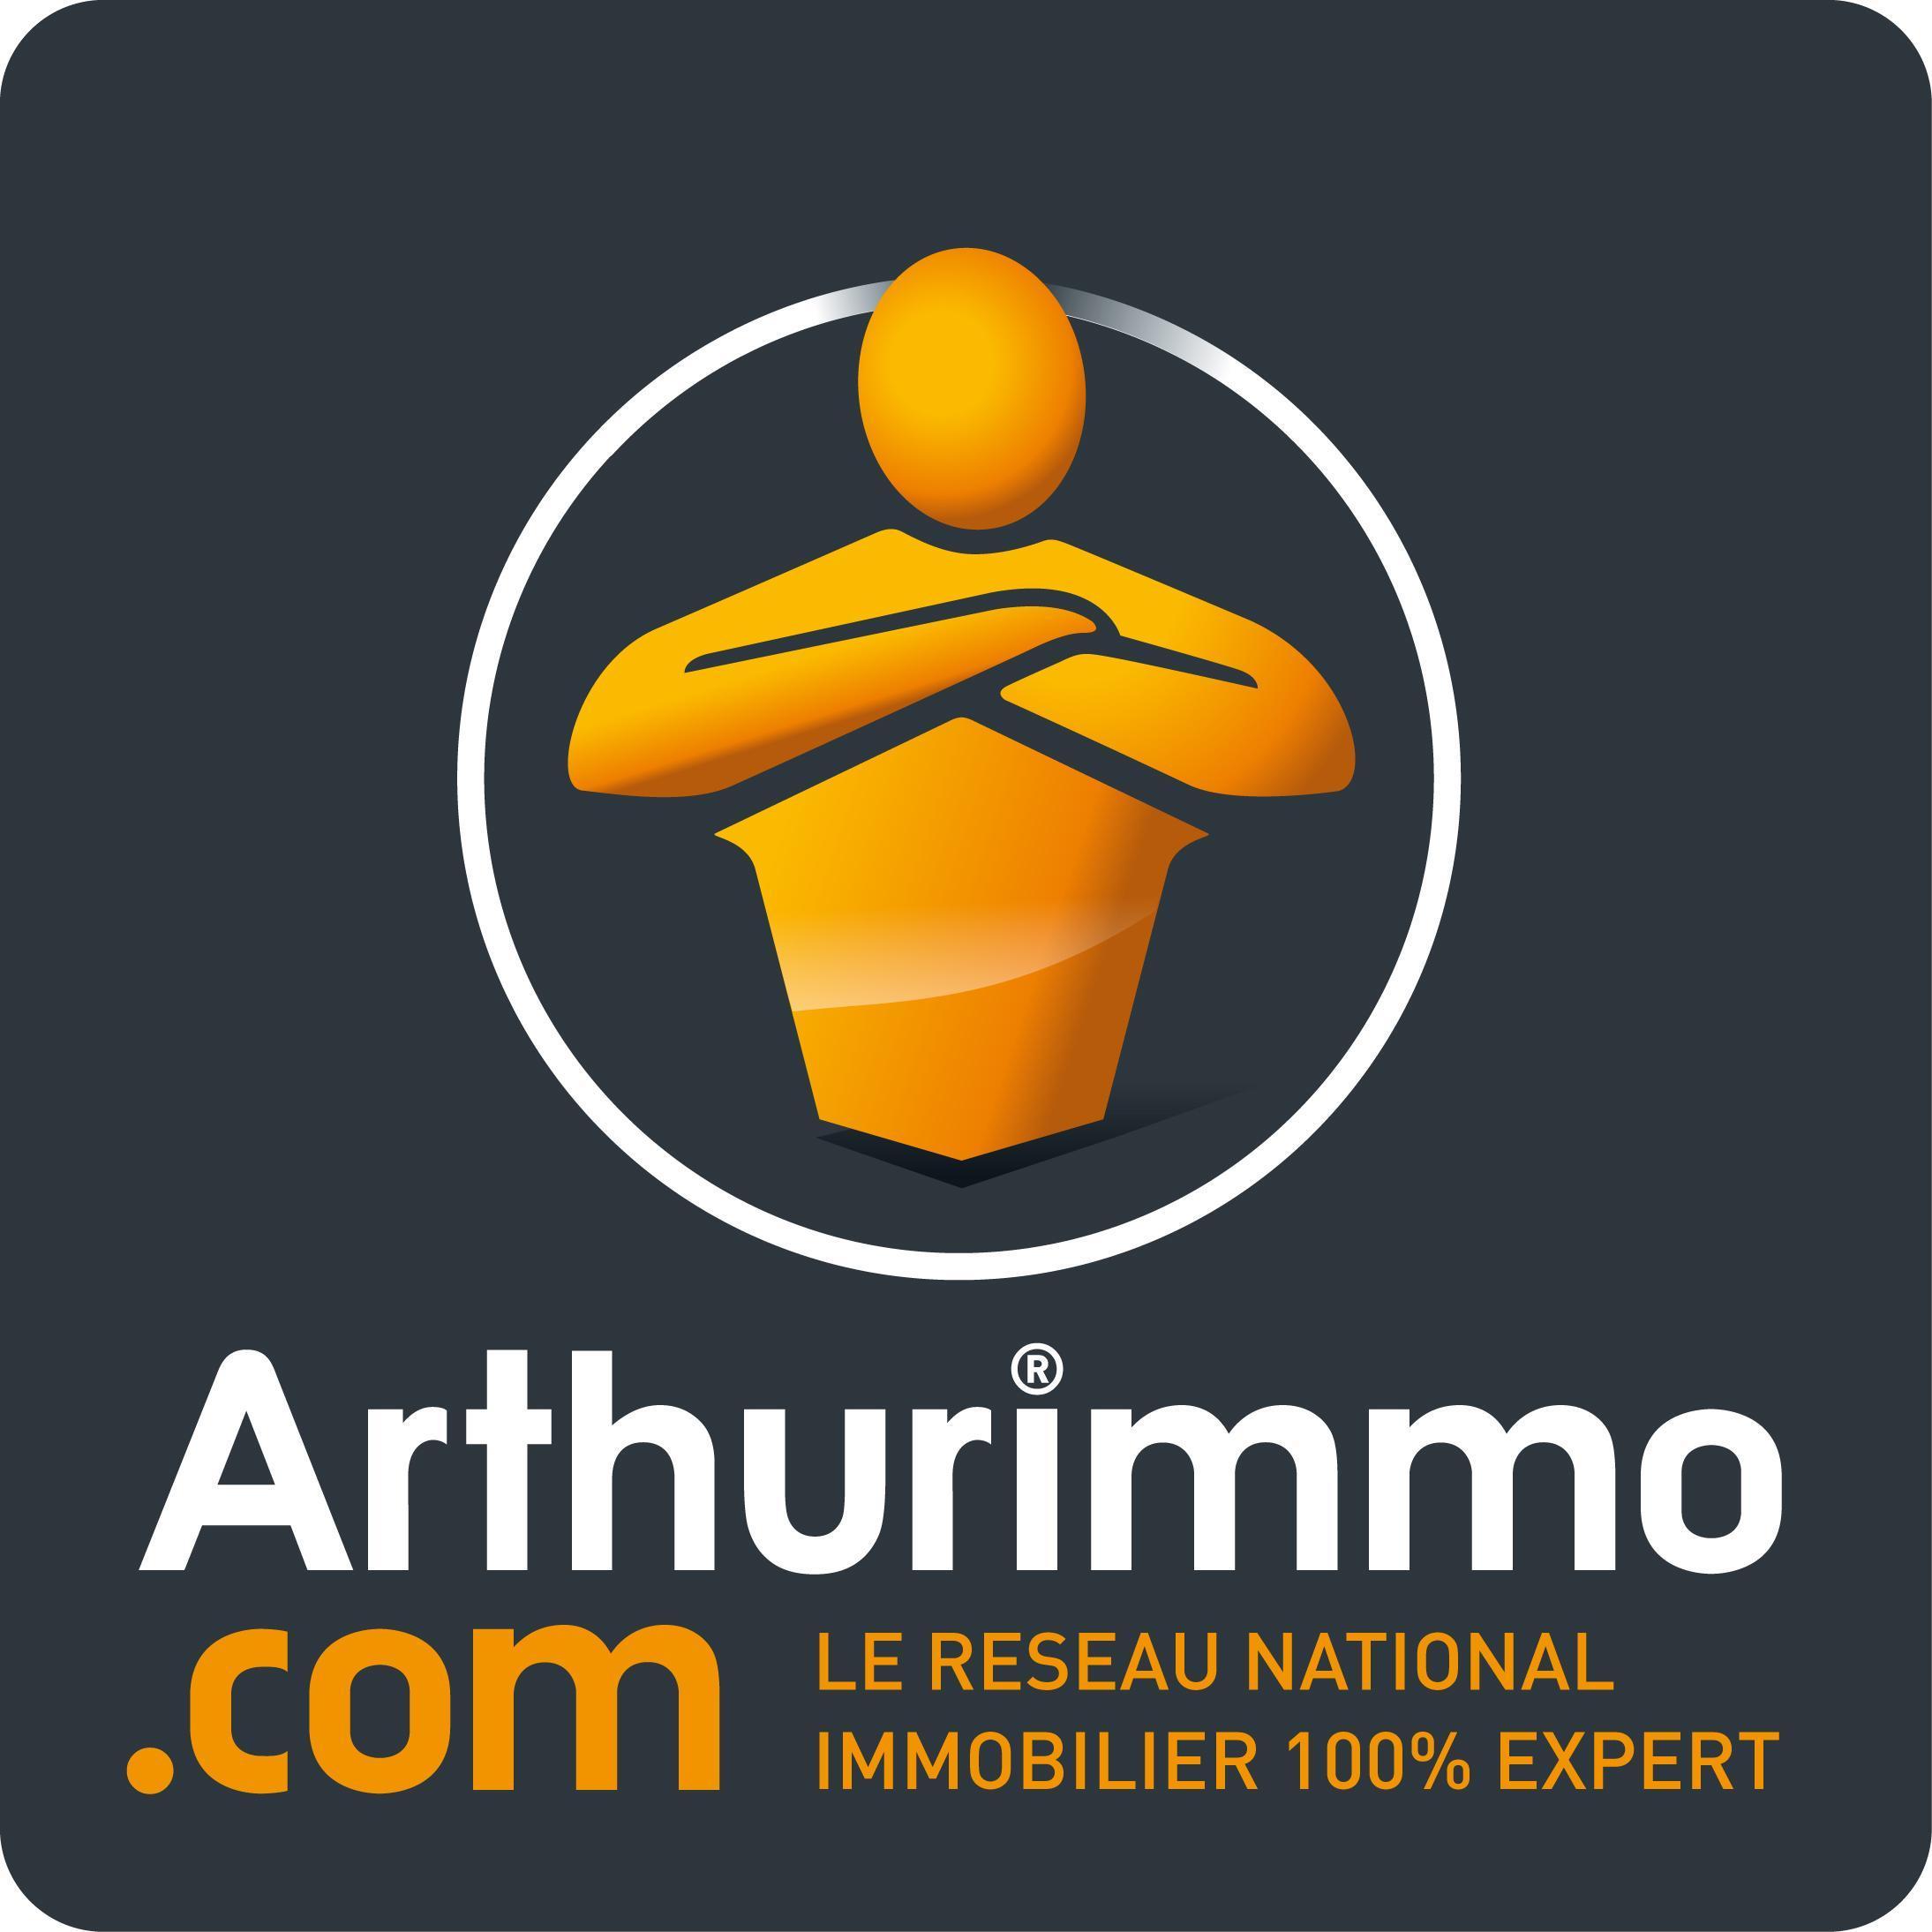 Arthurimmo.com Montlhéry agence immobilière Montlhéry (91310)